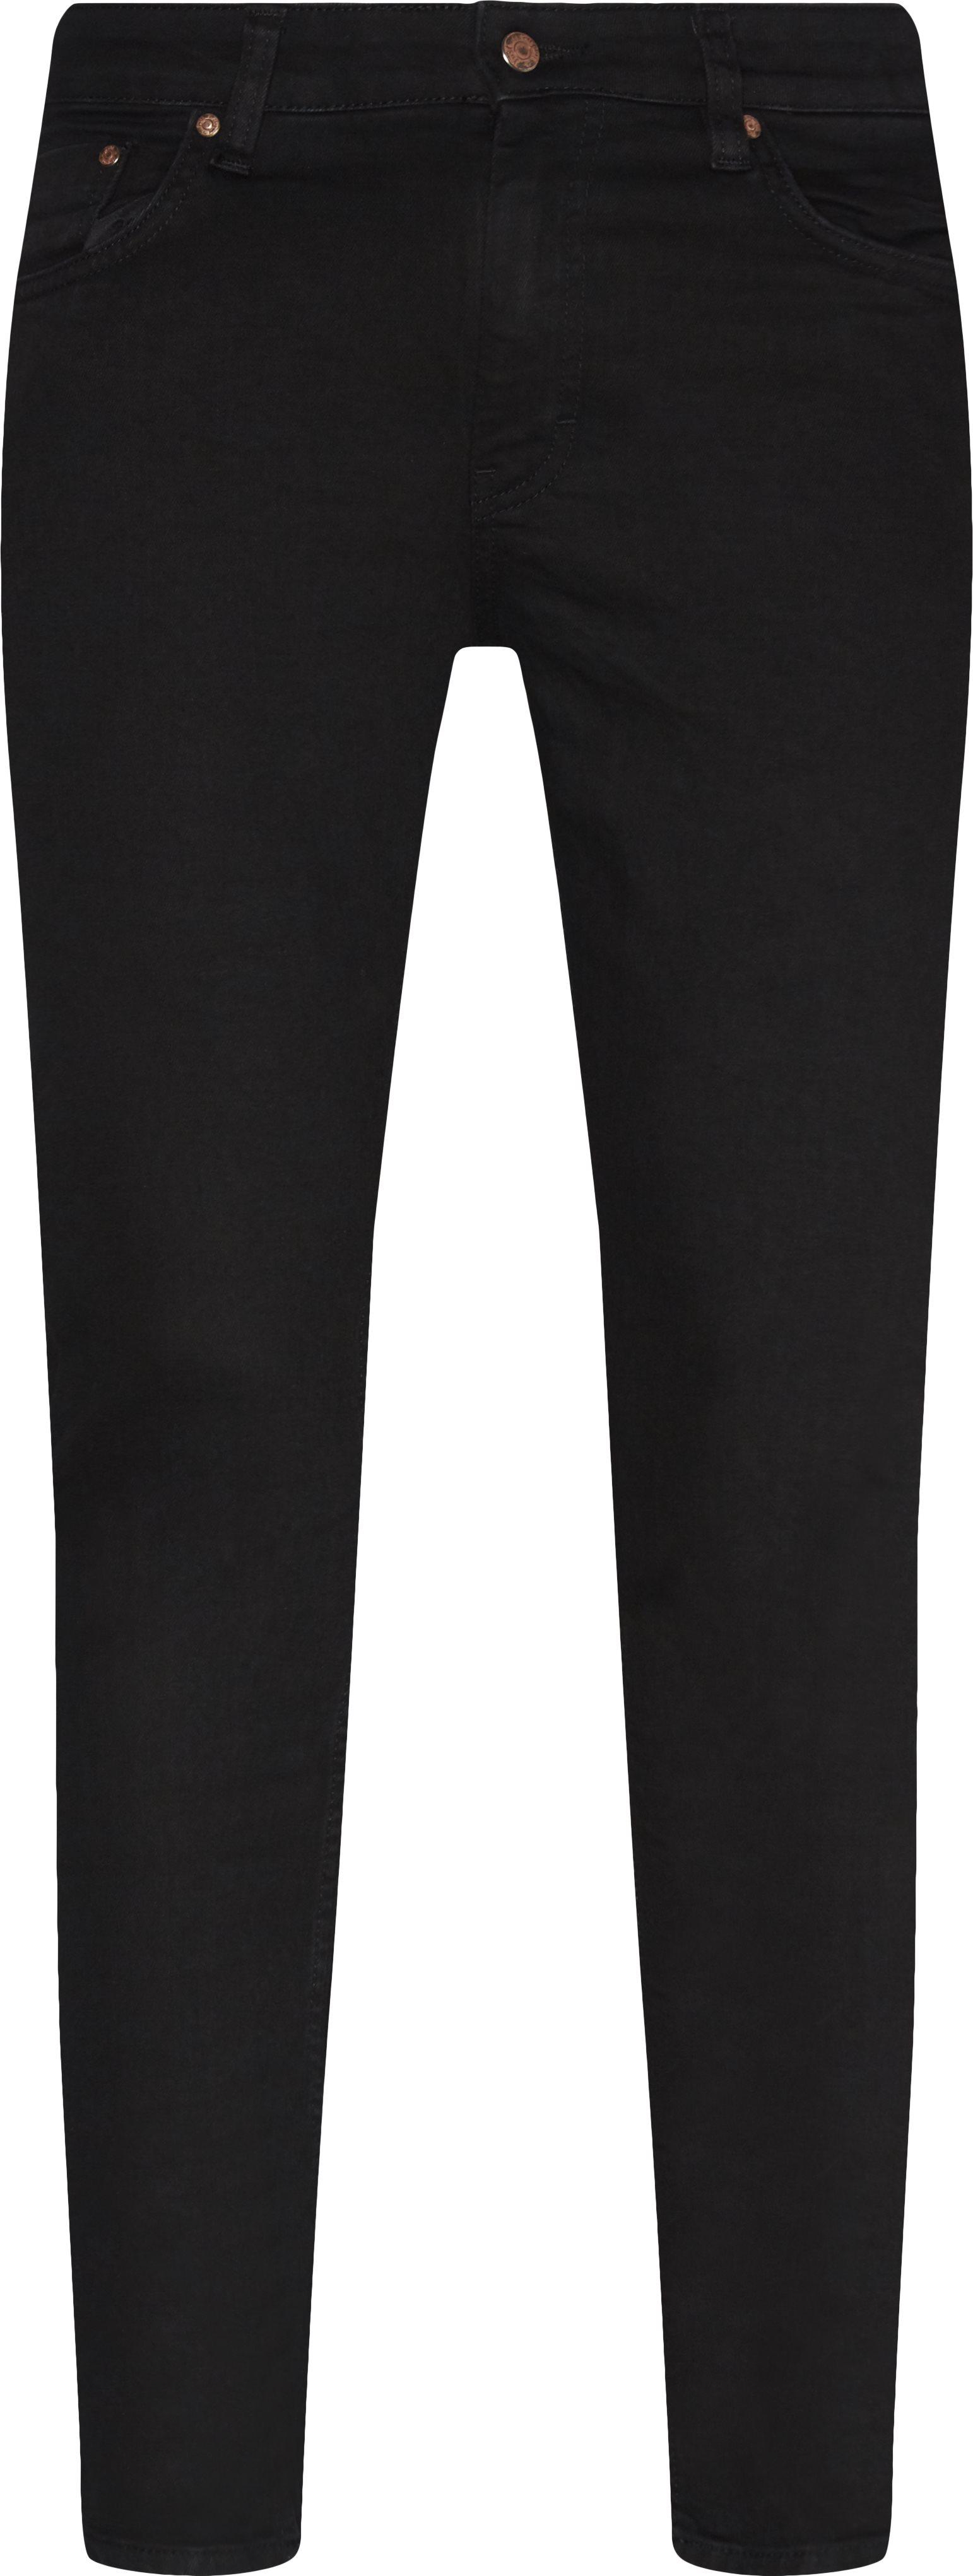 Sicko Black - Jeans - Slim fit - Sort